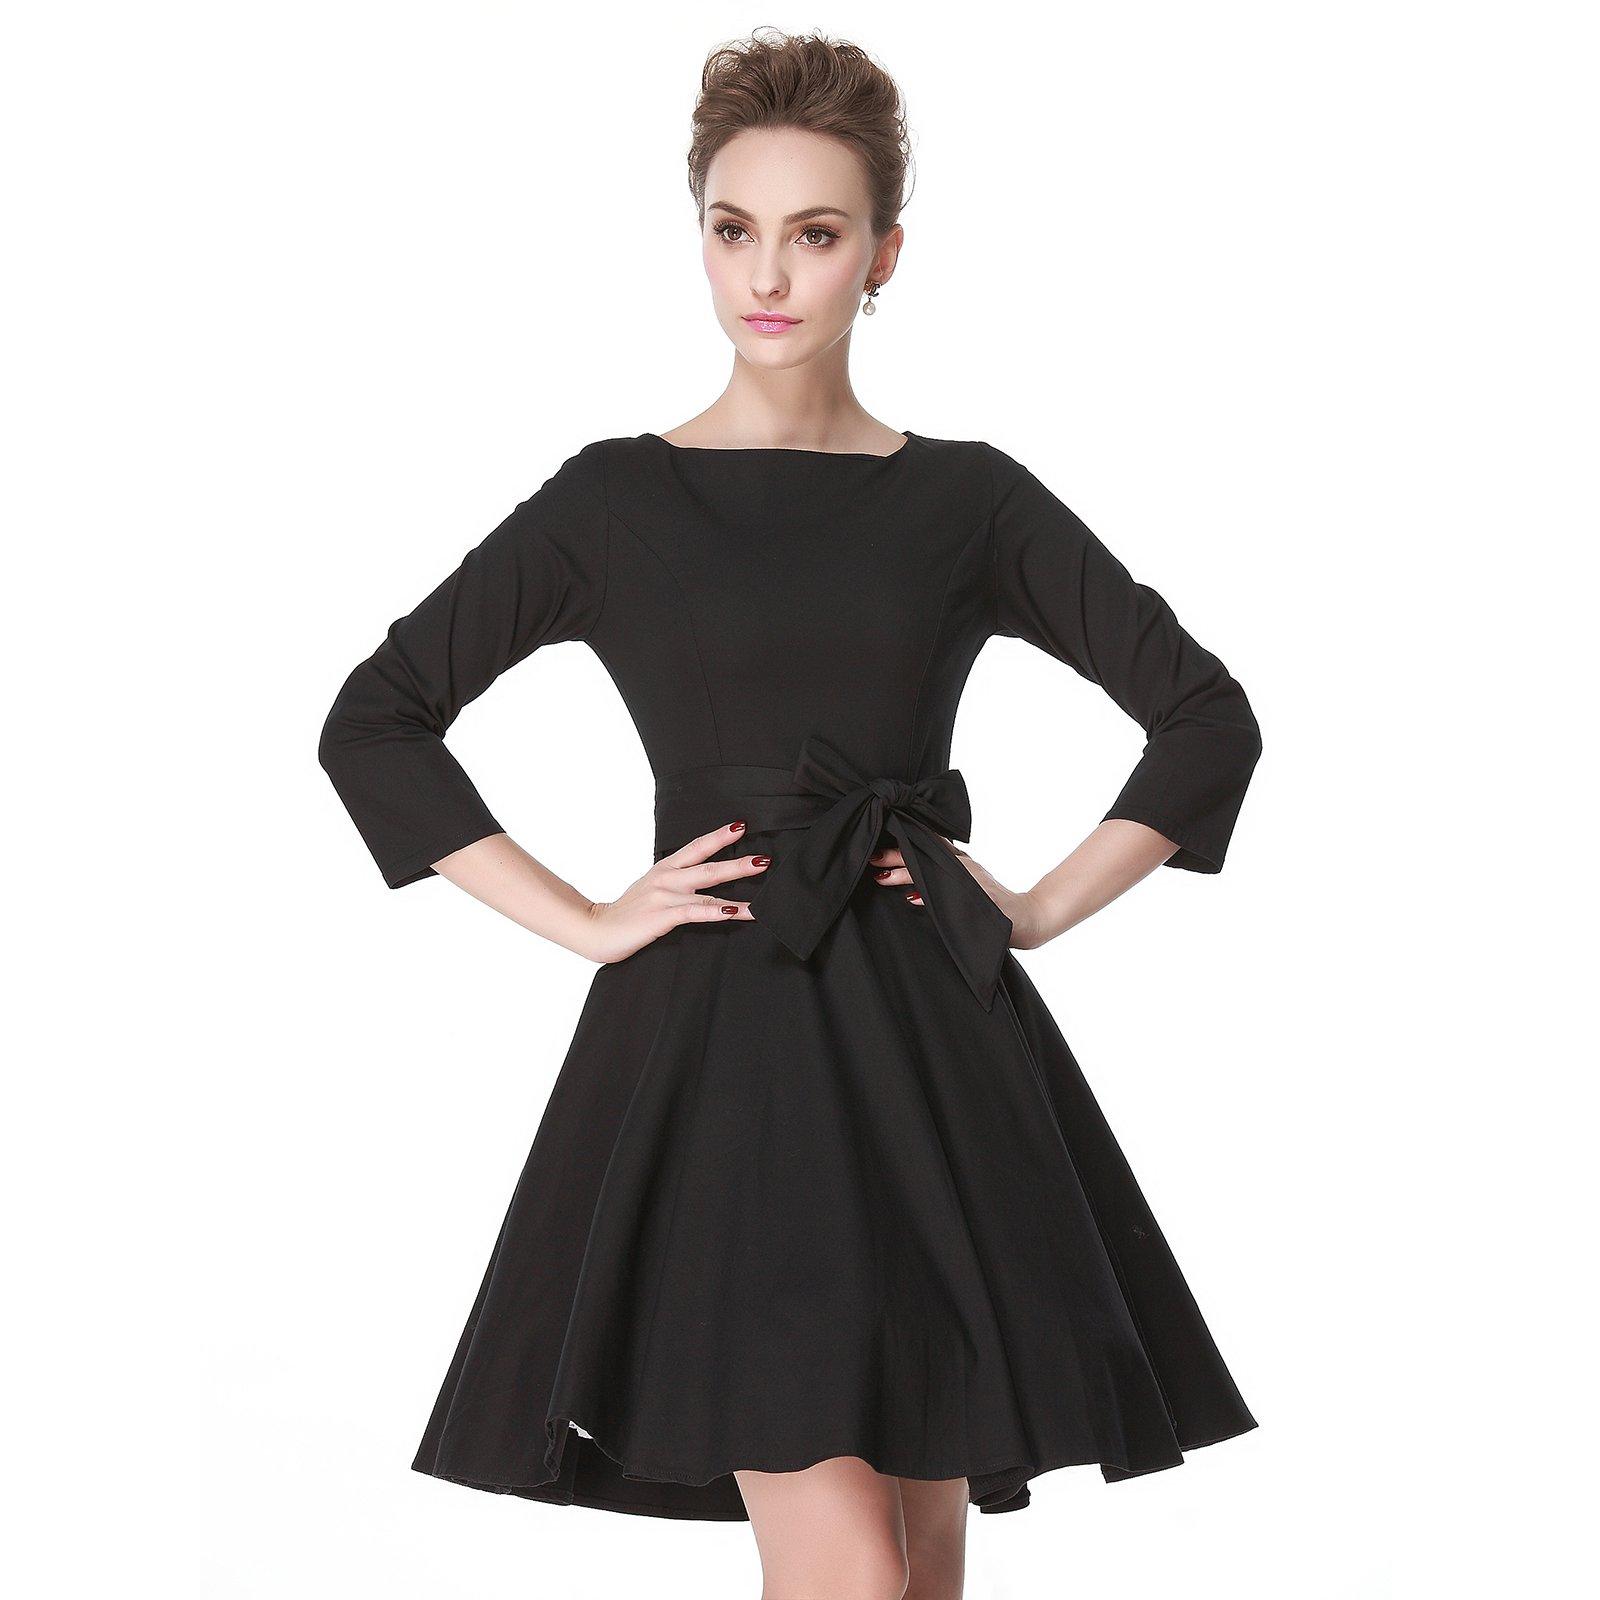 Heroecol 50s 60s Hepburn 3/4 Sleeve Style Vintage Retro Swing Rockailly Dresses Size XL Color Black by Heroecol (Image #3)